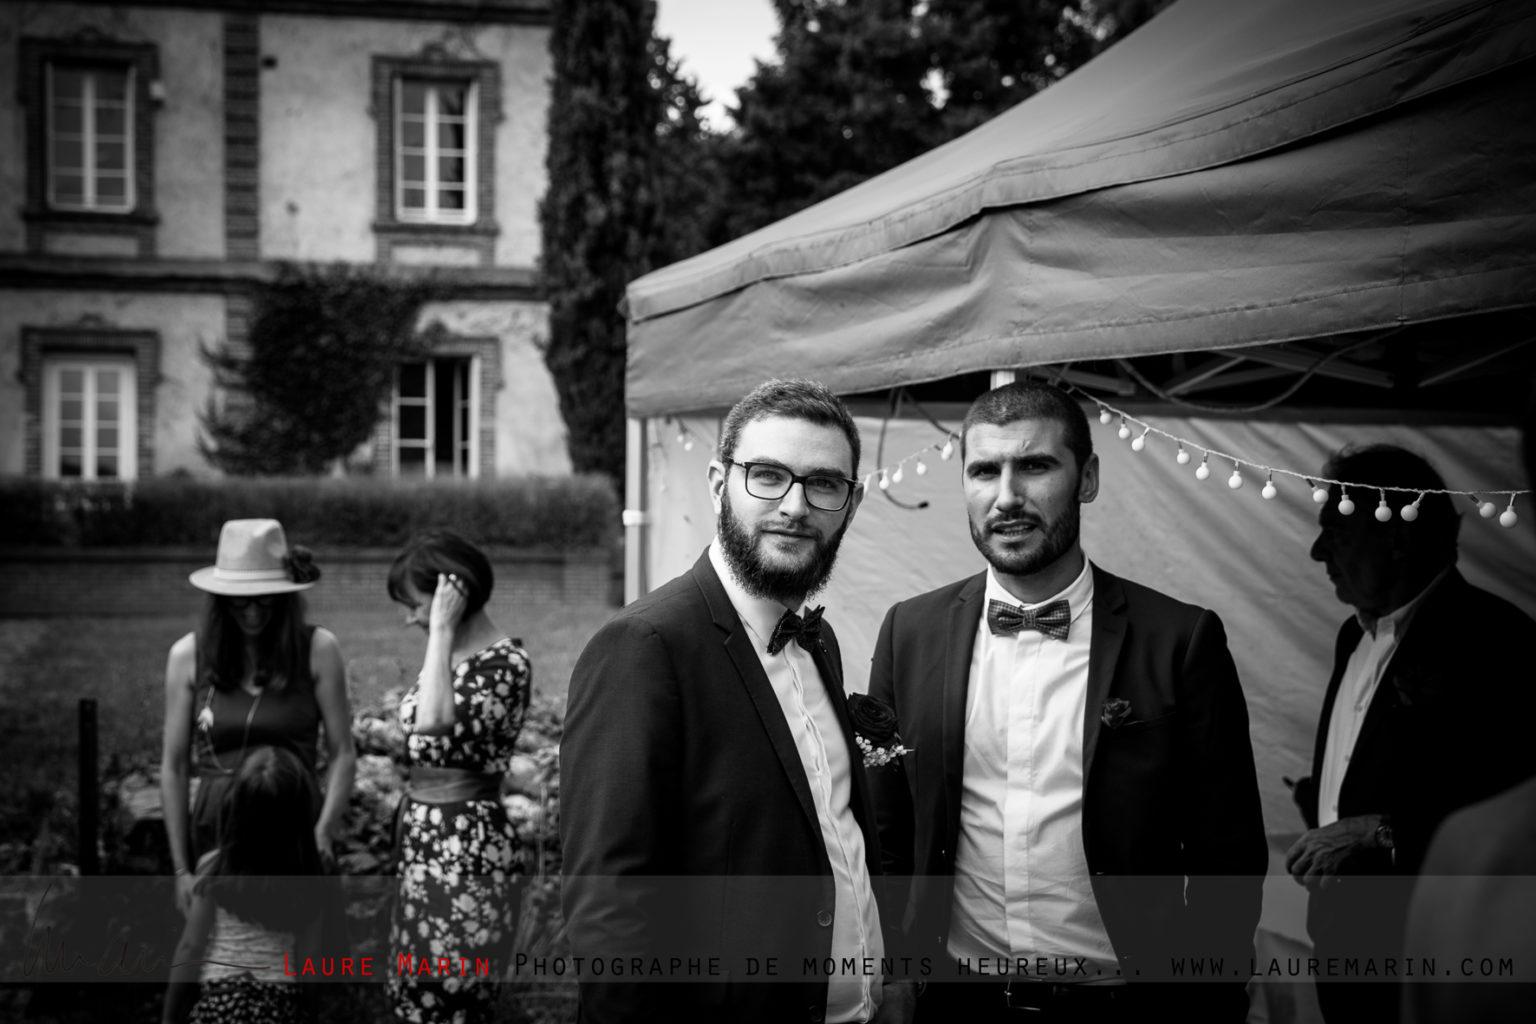 © Laure Marin Photographe Mariage Vin d'Honneur_2358